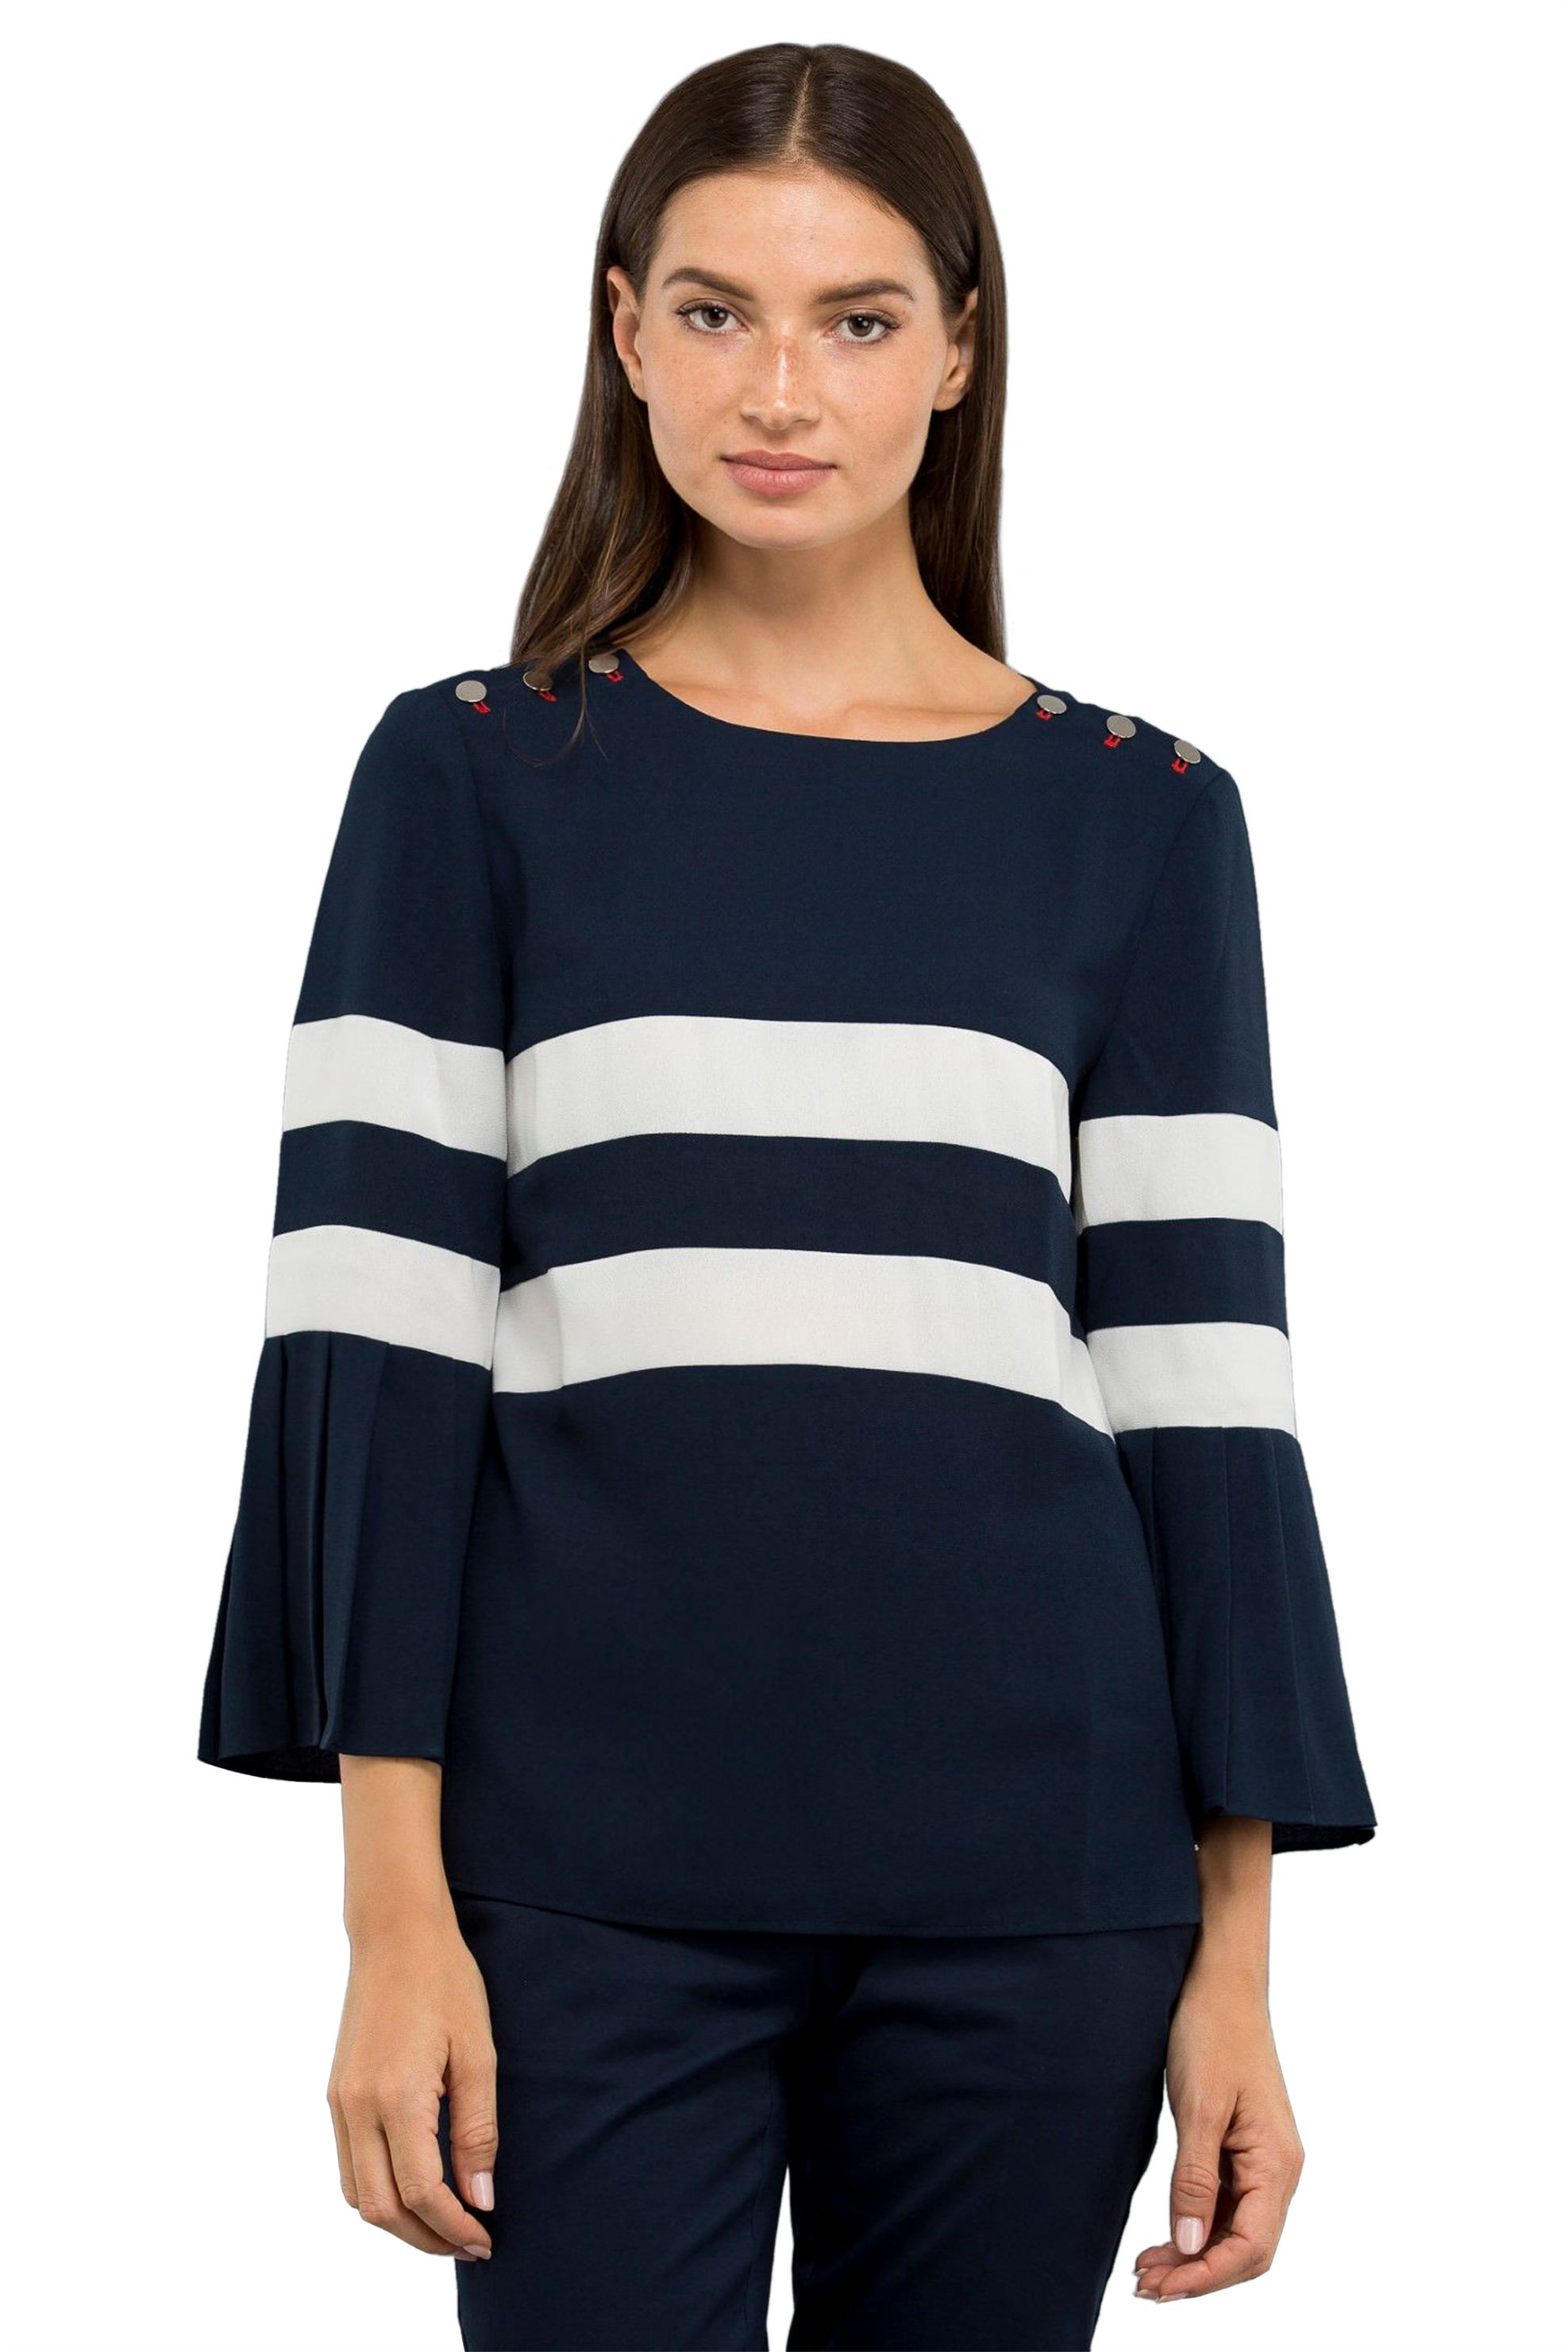 Nautica γυναικεία μπλούζα με κουμπιά στους ώμους και μανίκι 3/4 με πιέτες - 83W2 γυναικα   ρουχα   tops   μπλούζες   casual